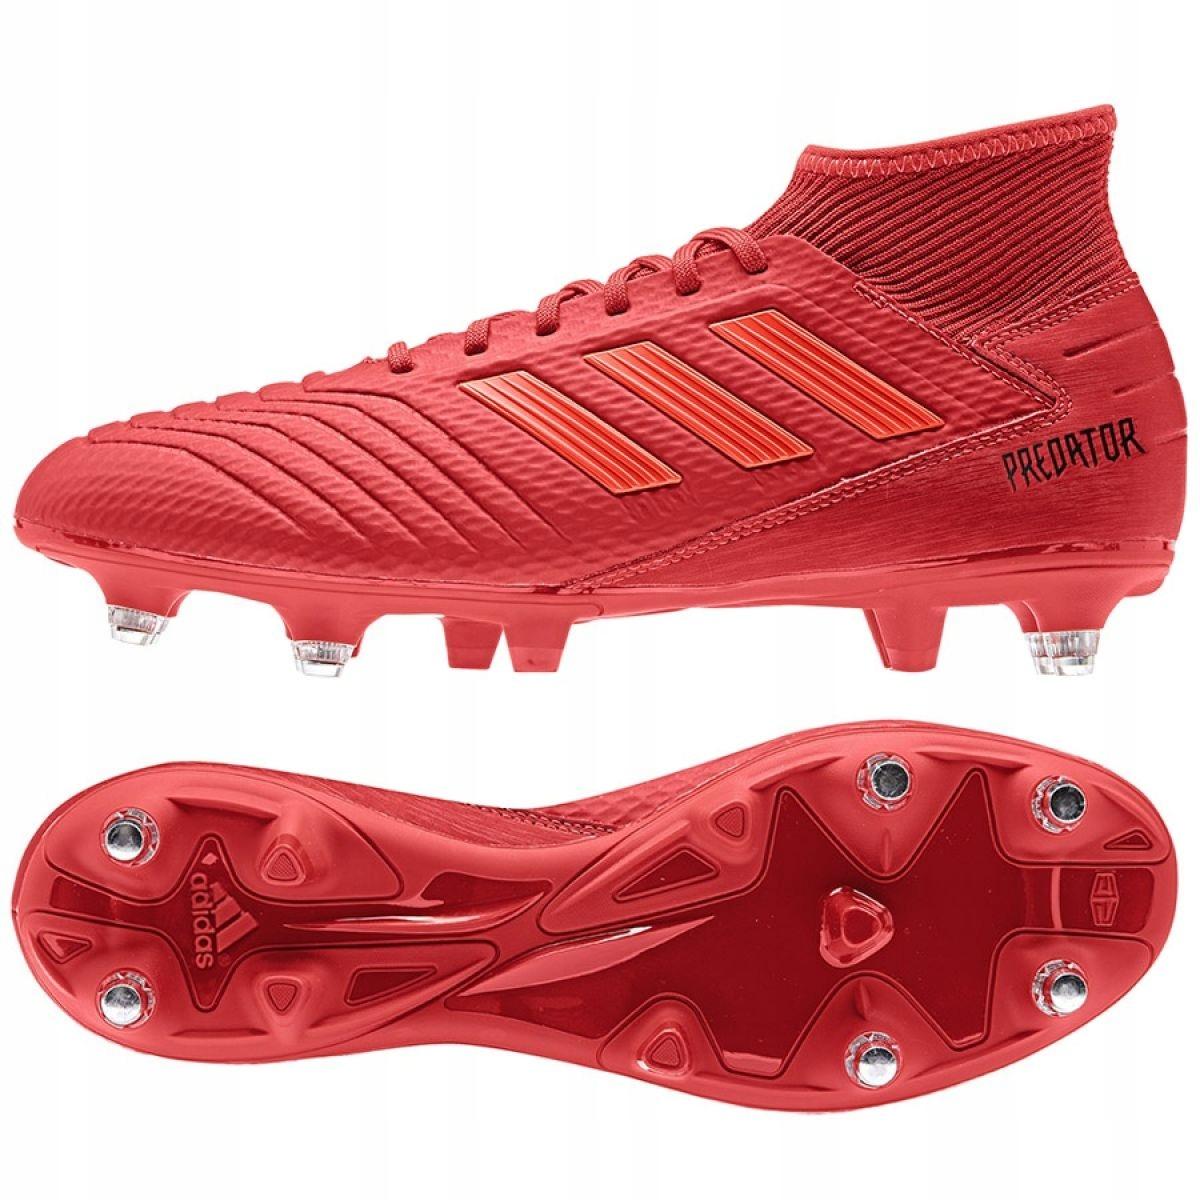 83bde36ccd9a Buty piłkarskie adidas Predator 19.3 SG M D979 44 - 7711792175 ...